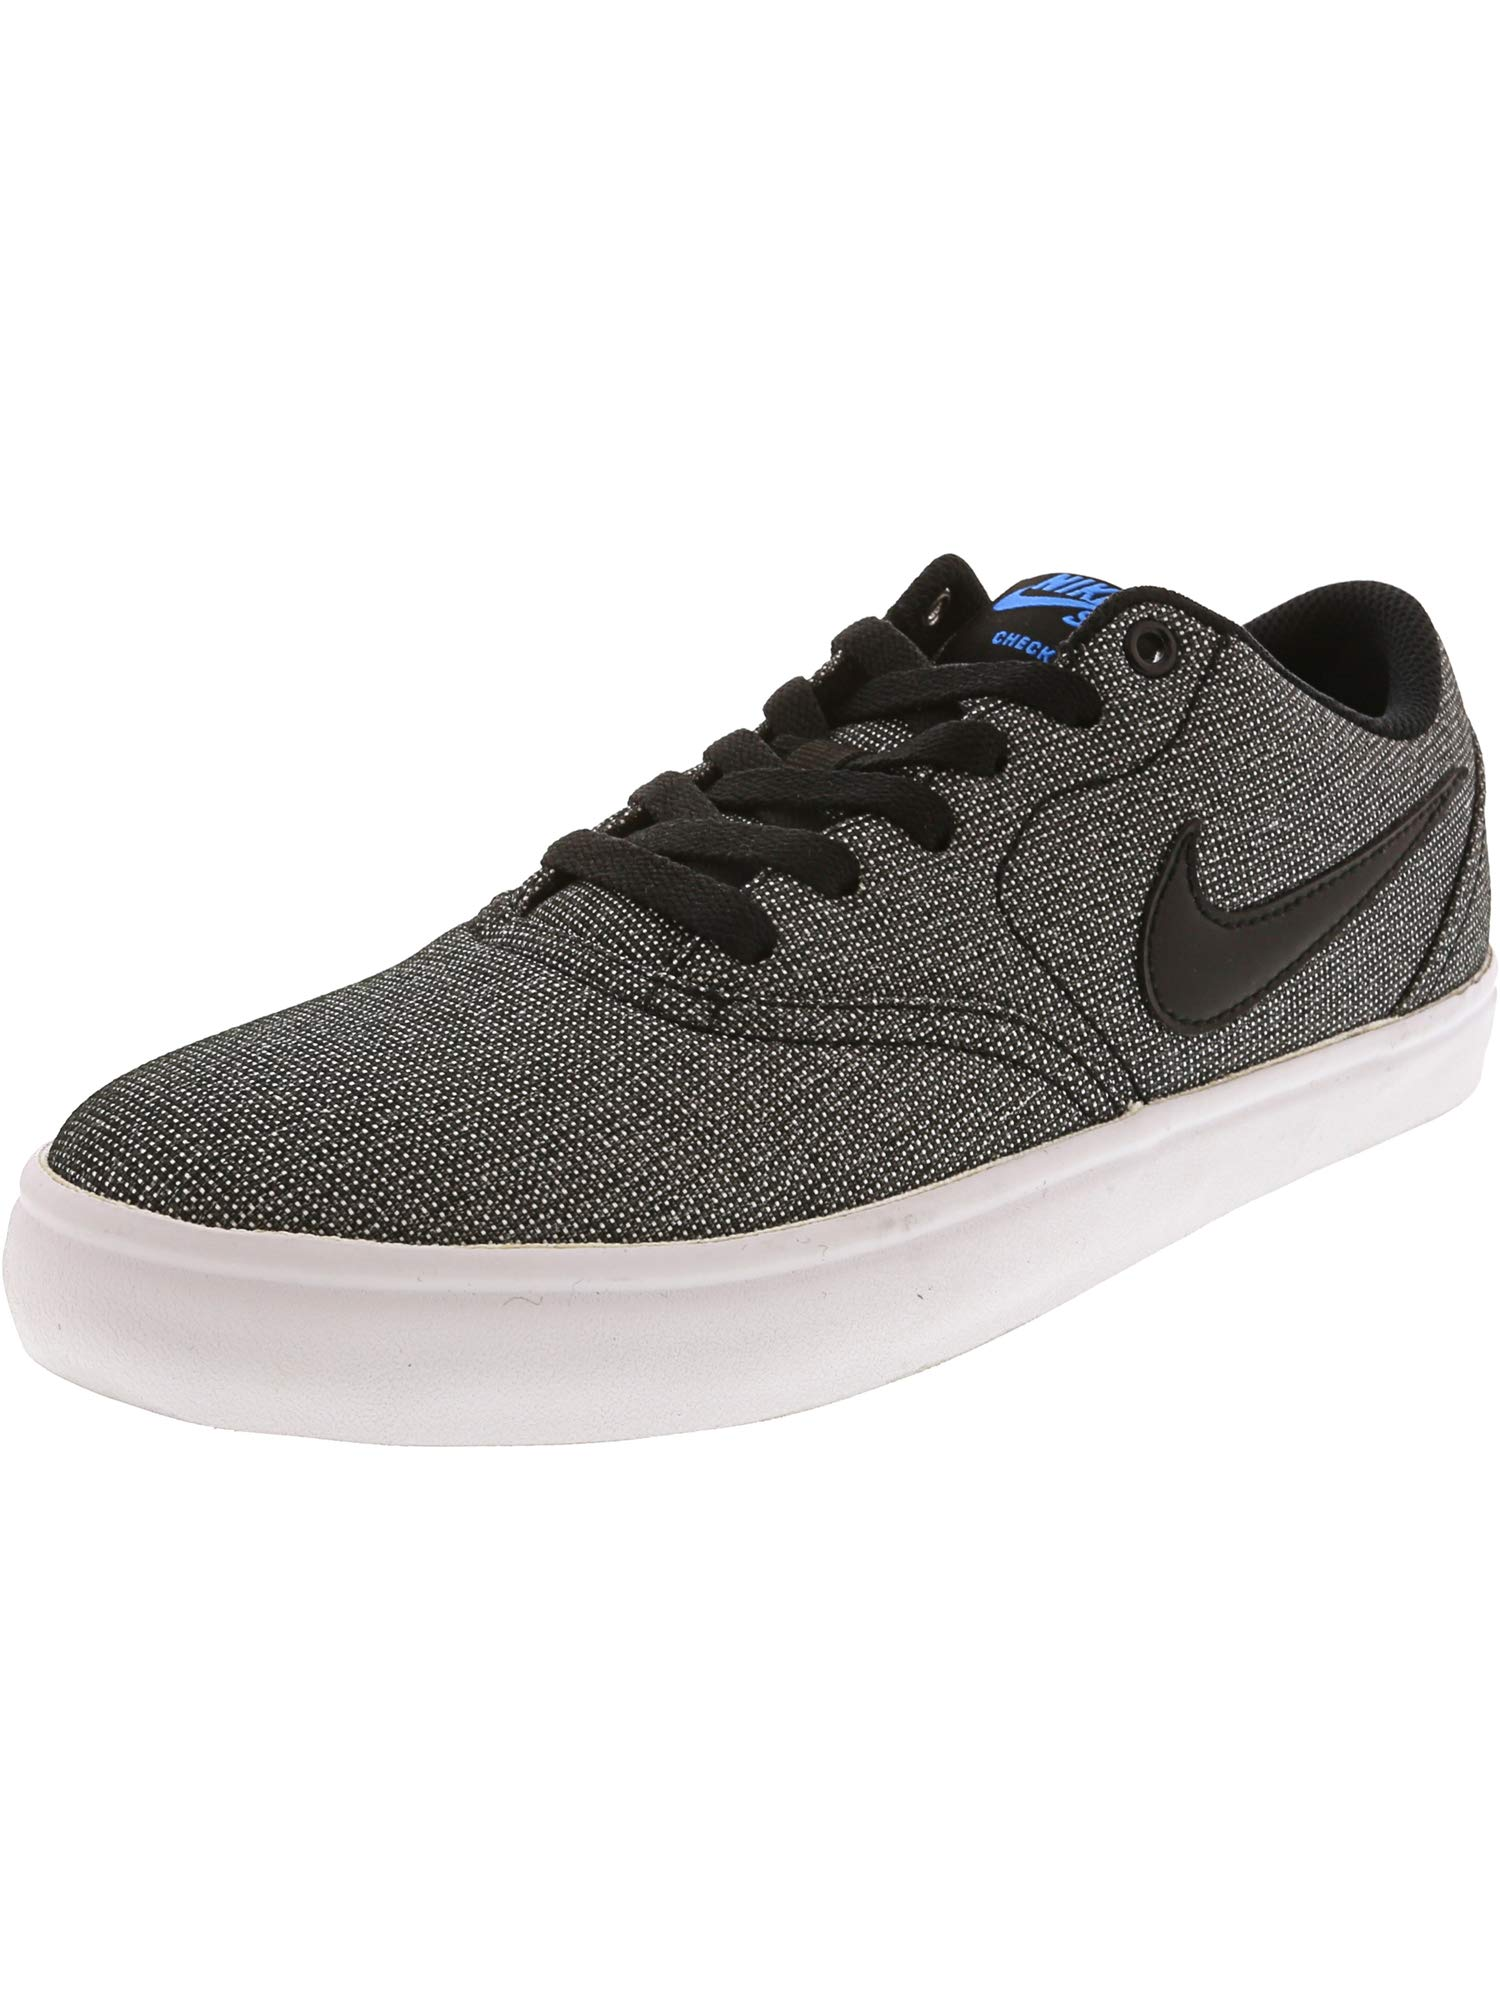 best service 0ca8a 92dc3 Galleon - Nike Men s SB Check Solar Canvas Skate Shoe, Grey Black Photo  Blue Black, 7.5 M US